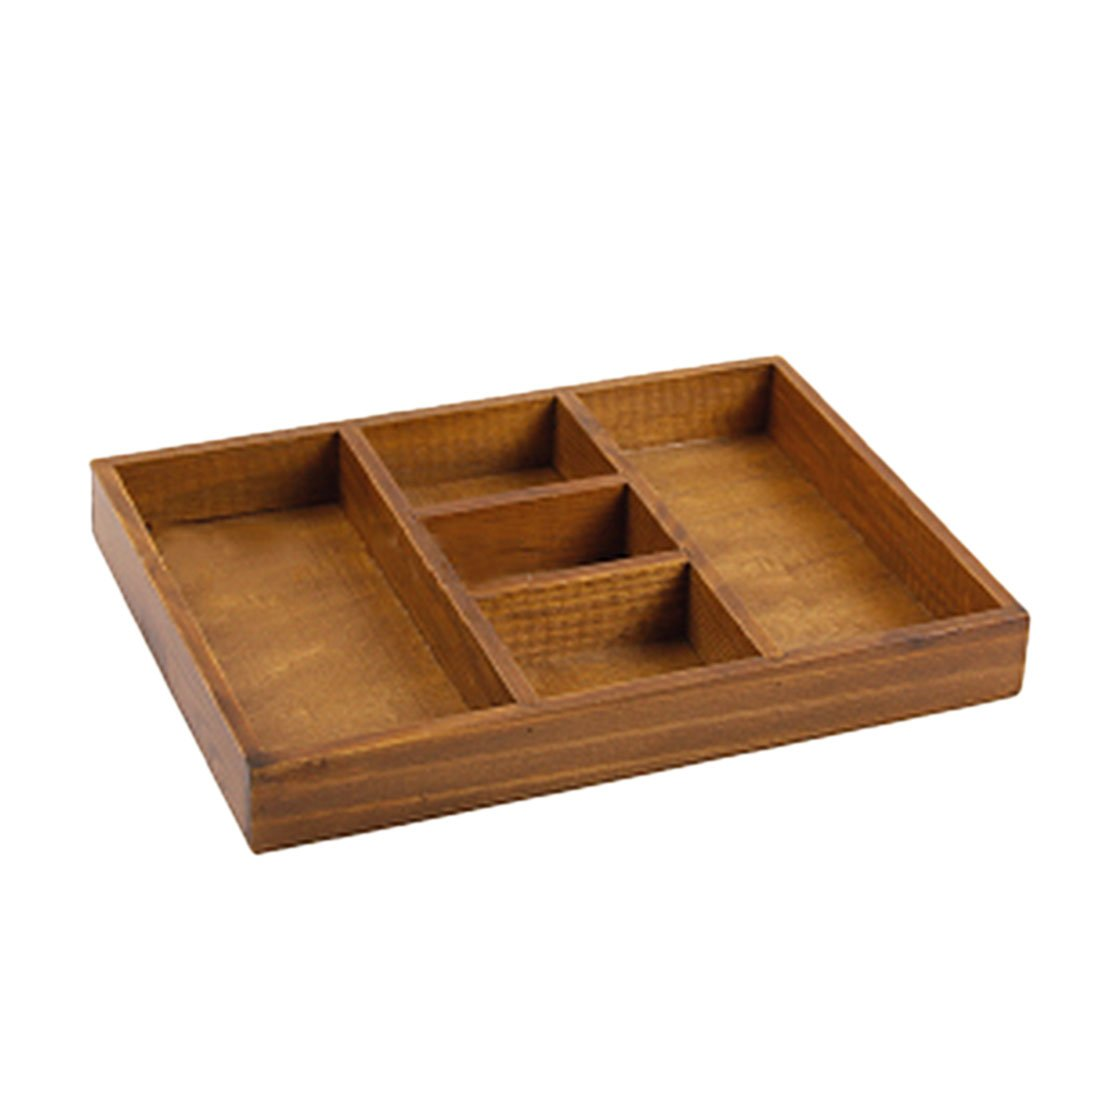 haoun 1 x Retro Storage Box Wood Desktop Organizer Tray [5-compartment]